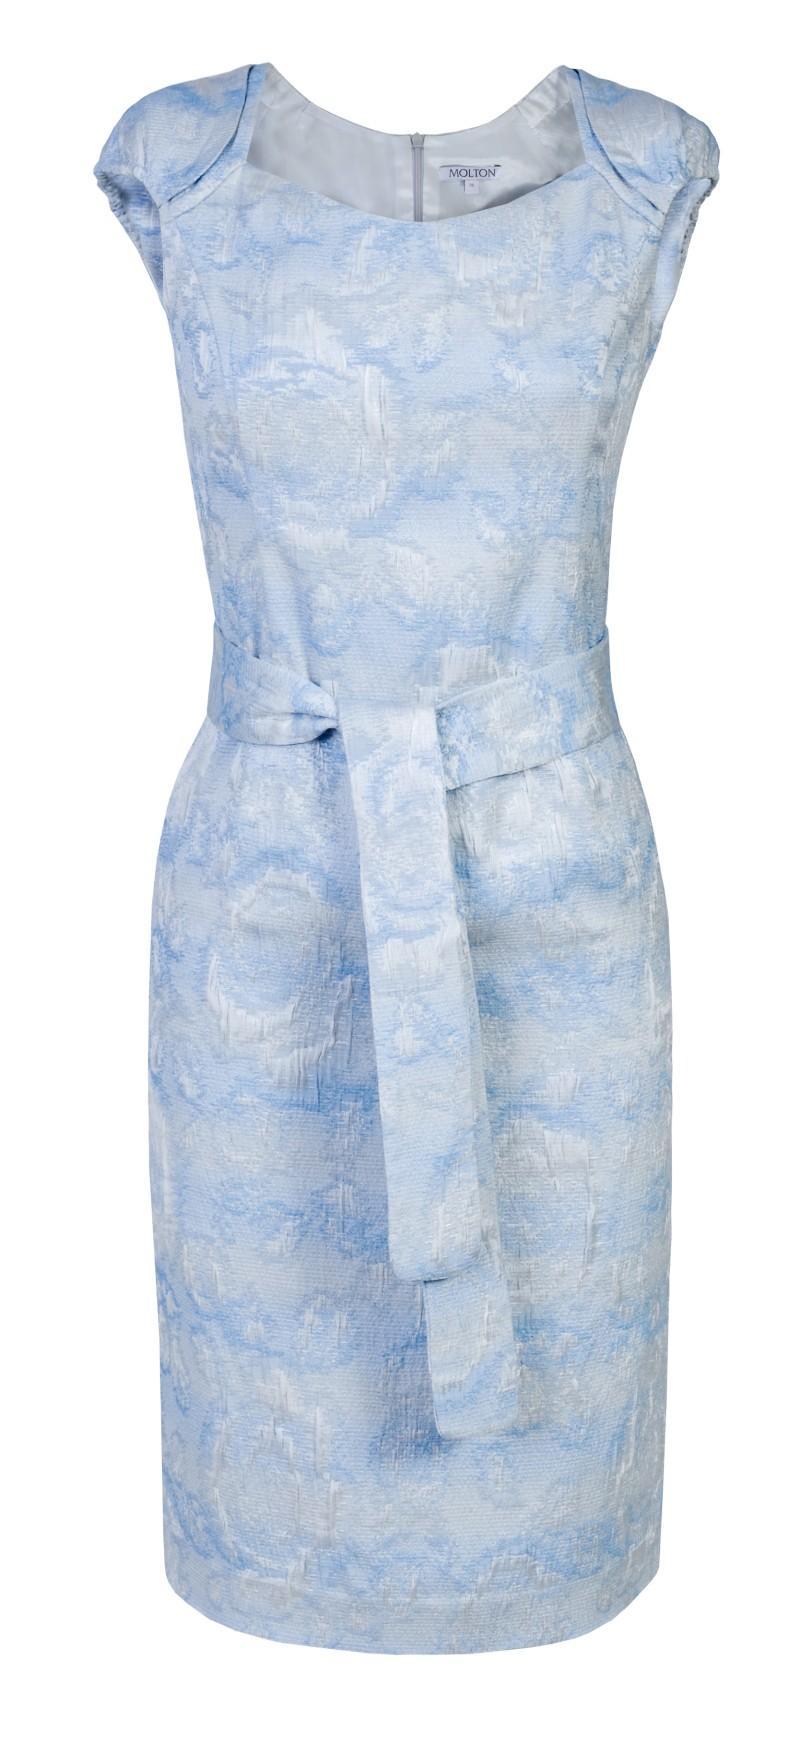 błękitna sukienka Molton - letnia kolekcja